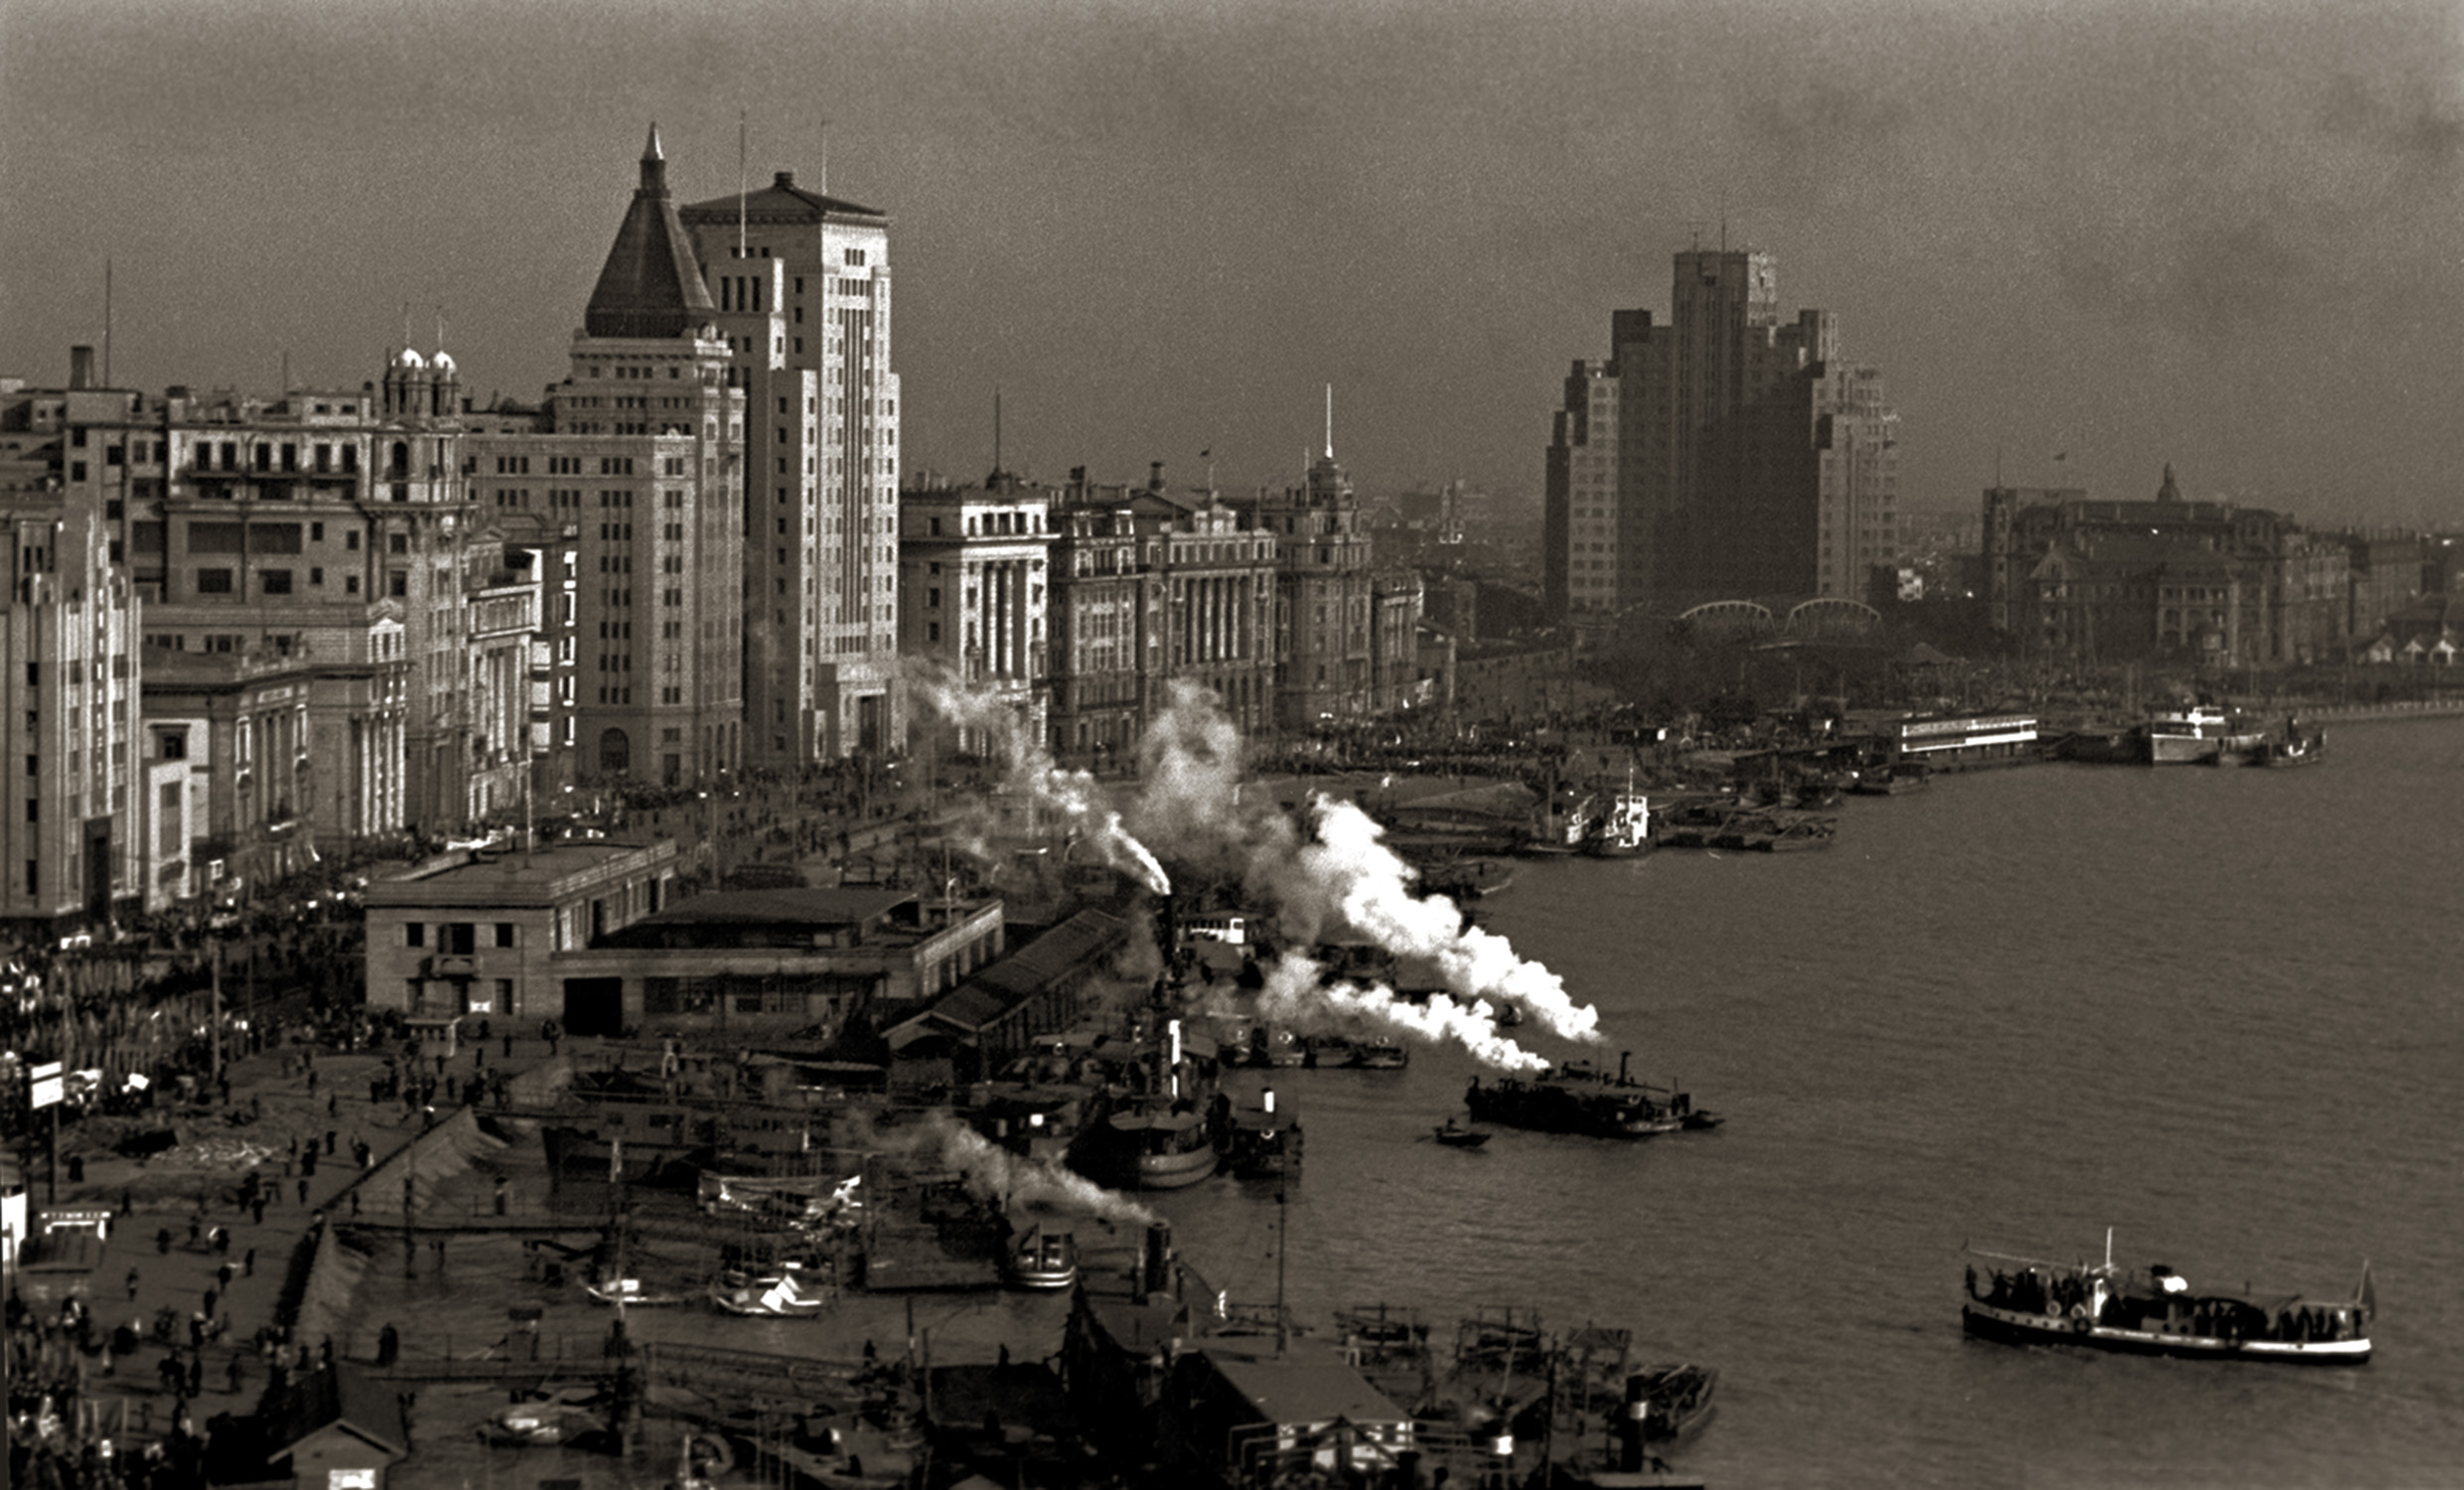 从气象台眺望北外滩, Overlooking the Bund, early 1950s / Courtesy of Jin Hua